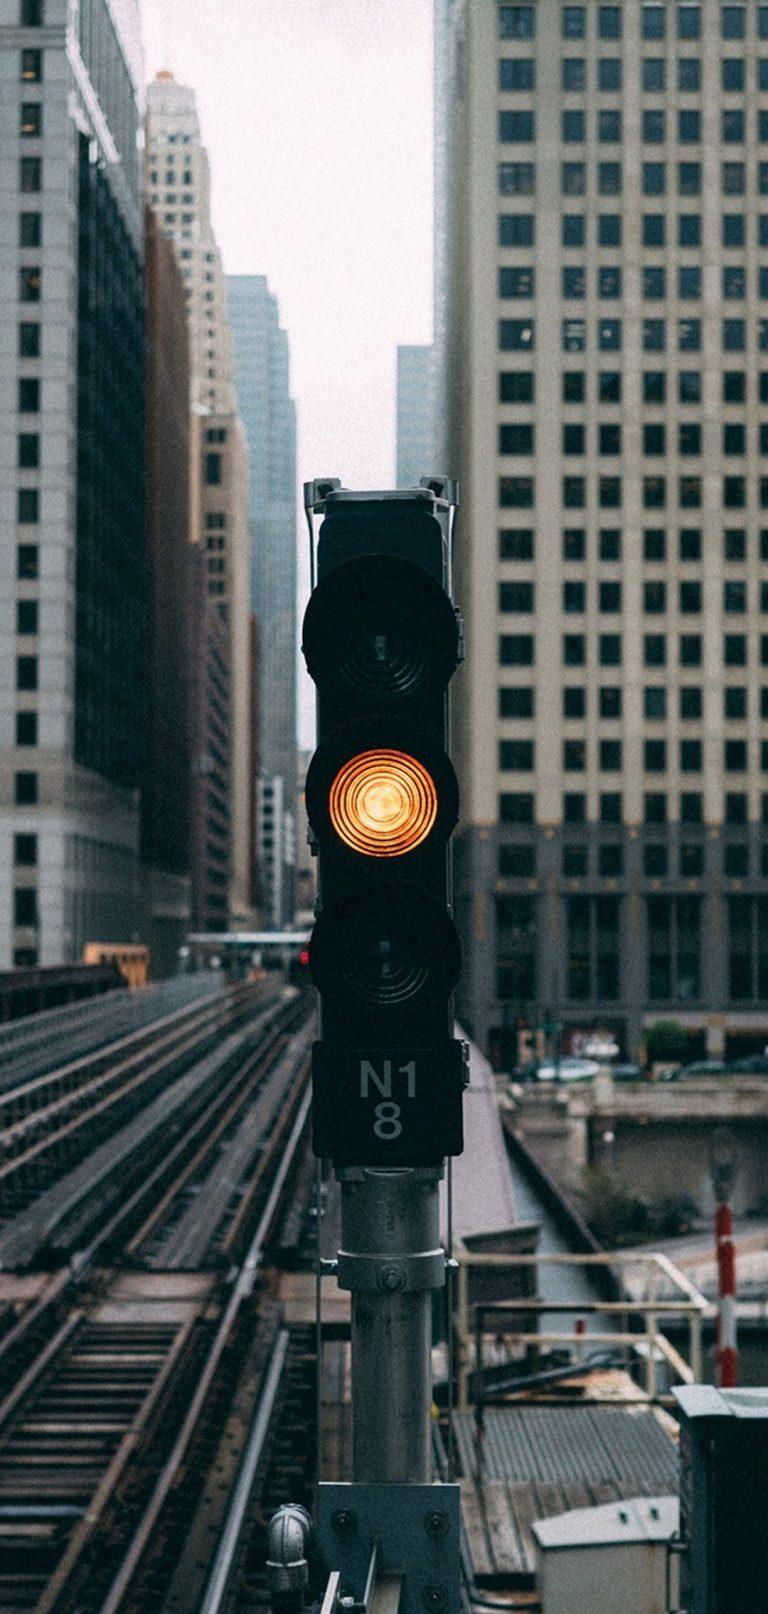 Traffic Lights City Buildings 1080x2270 768x1614